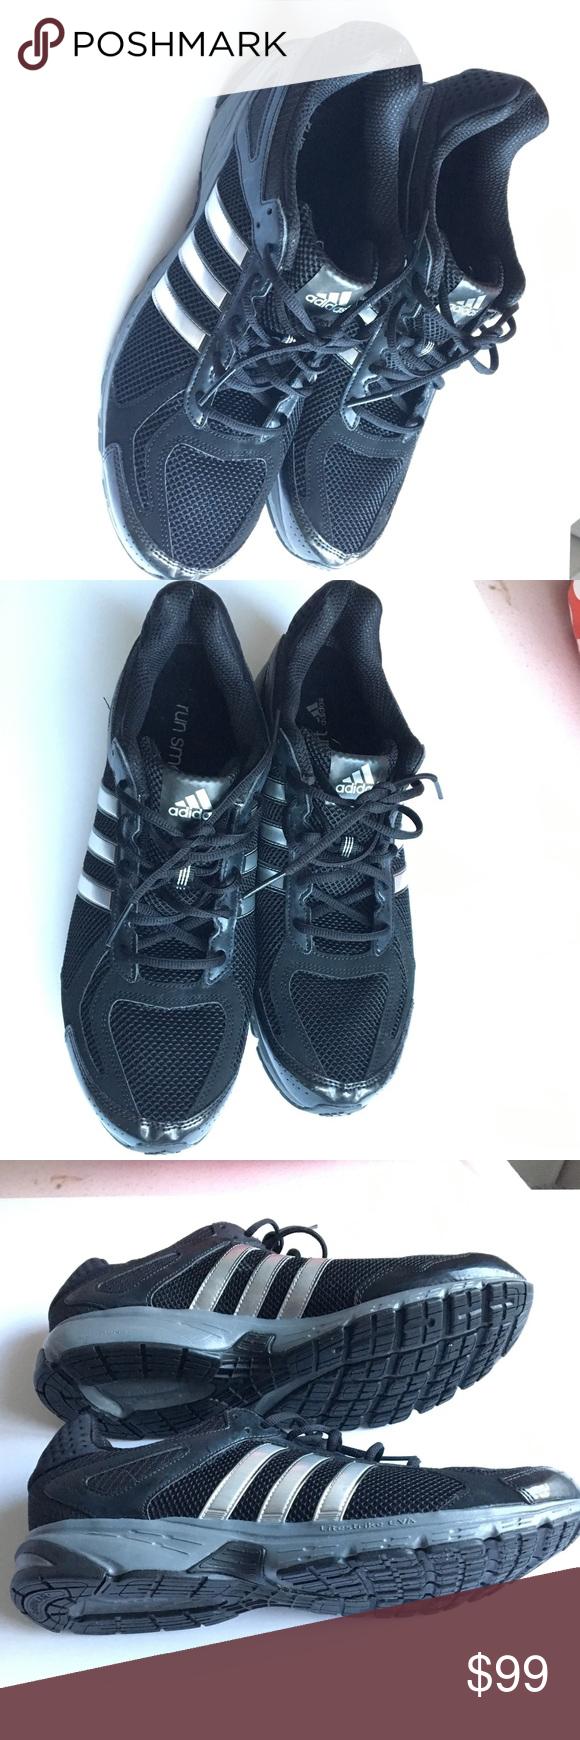 Adidas Triple Black Running Shoes size